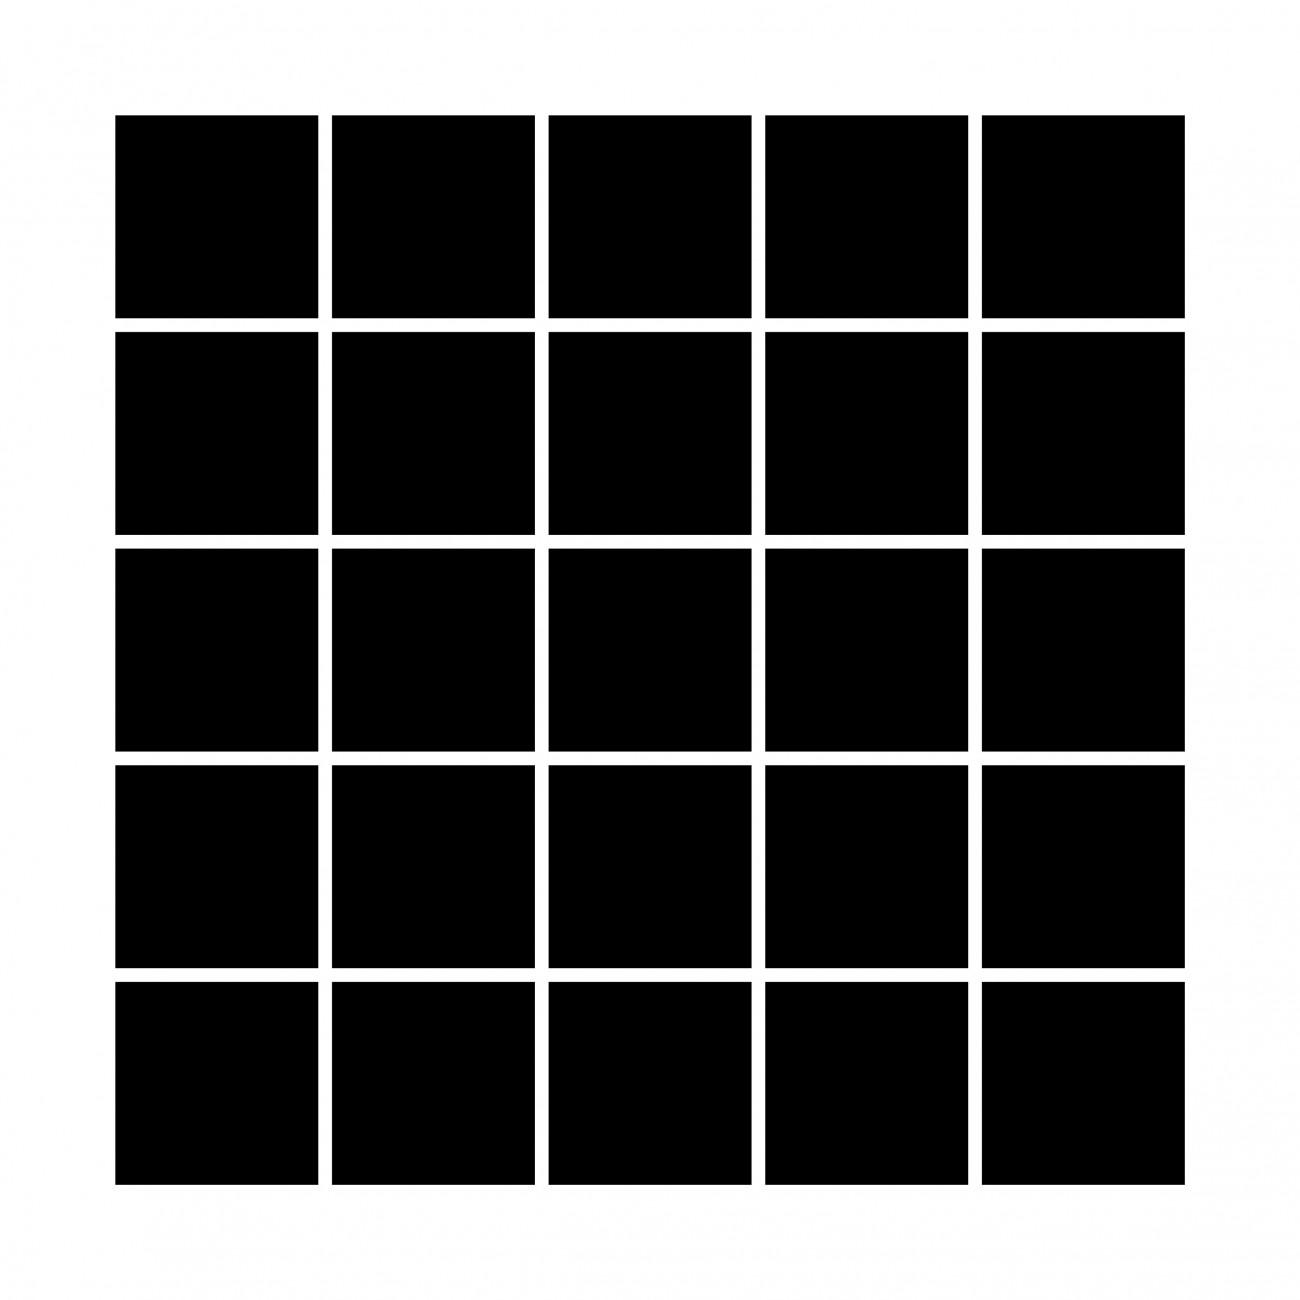 Kvadratisk 03 - 25 bilder